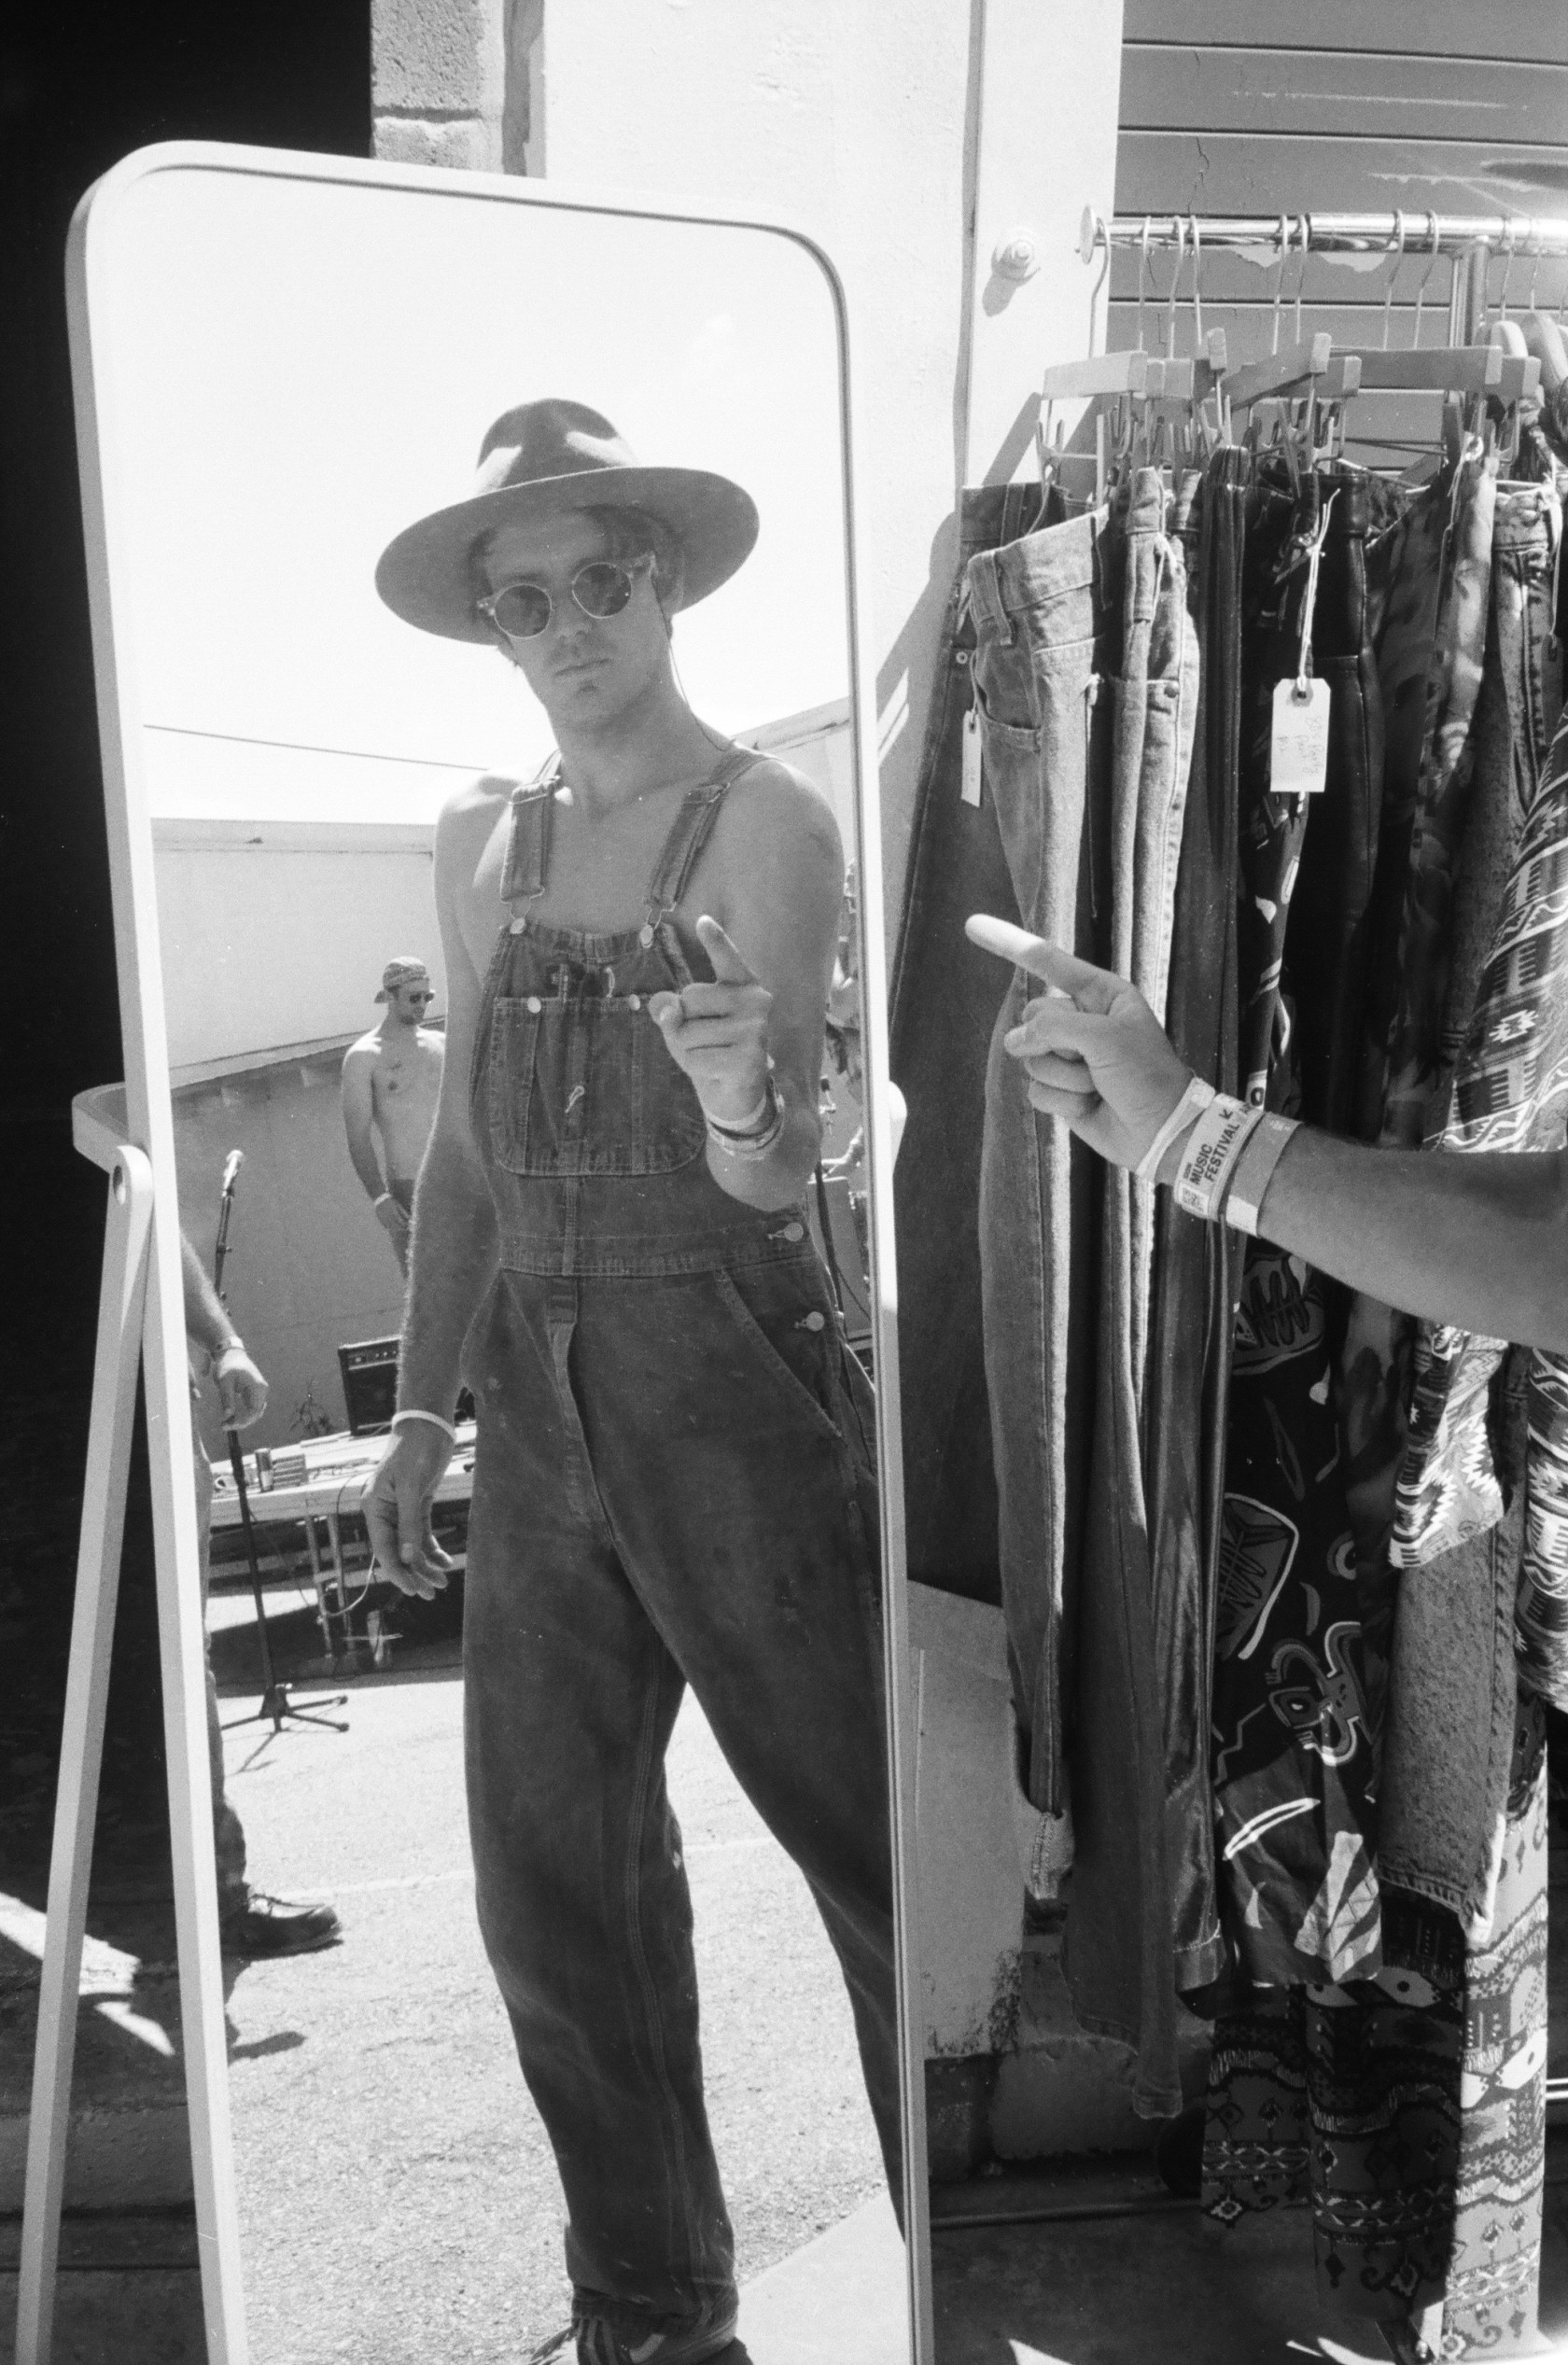 """Levi Prairie of Distractor SXSW"" Austin, Texas 35mm 2017"